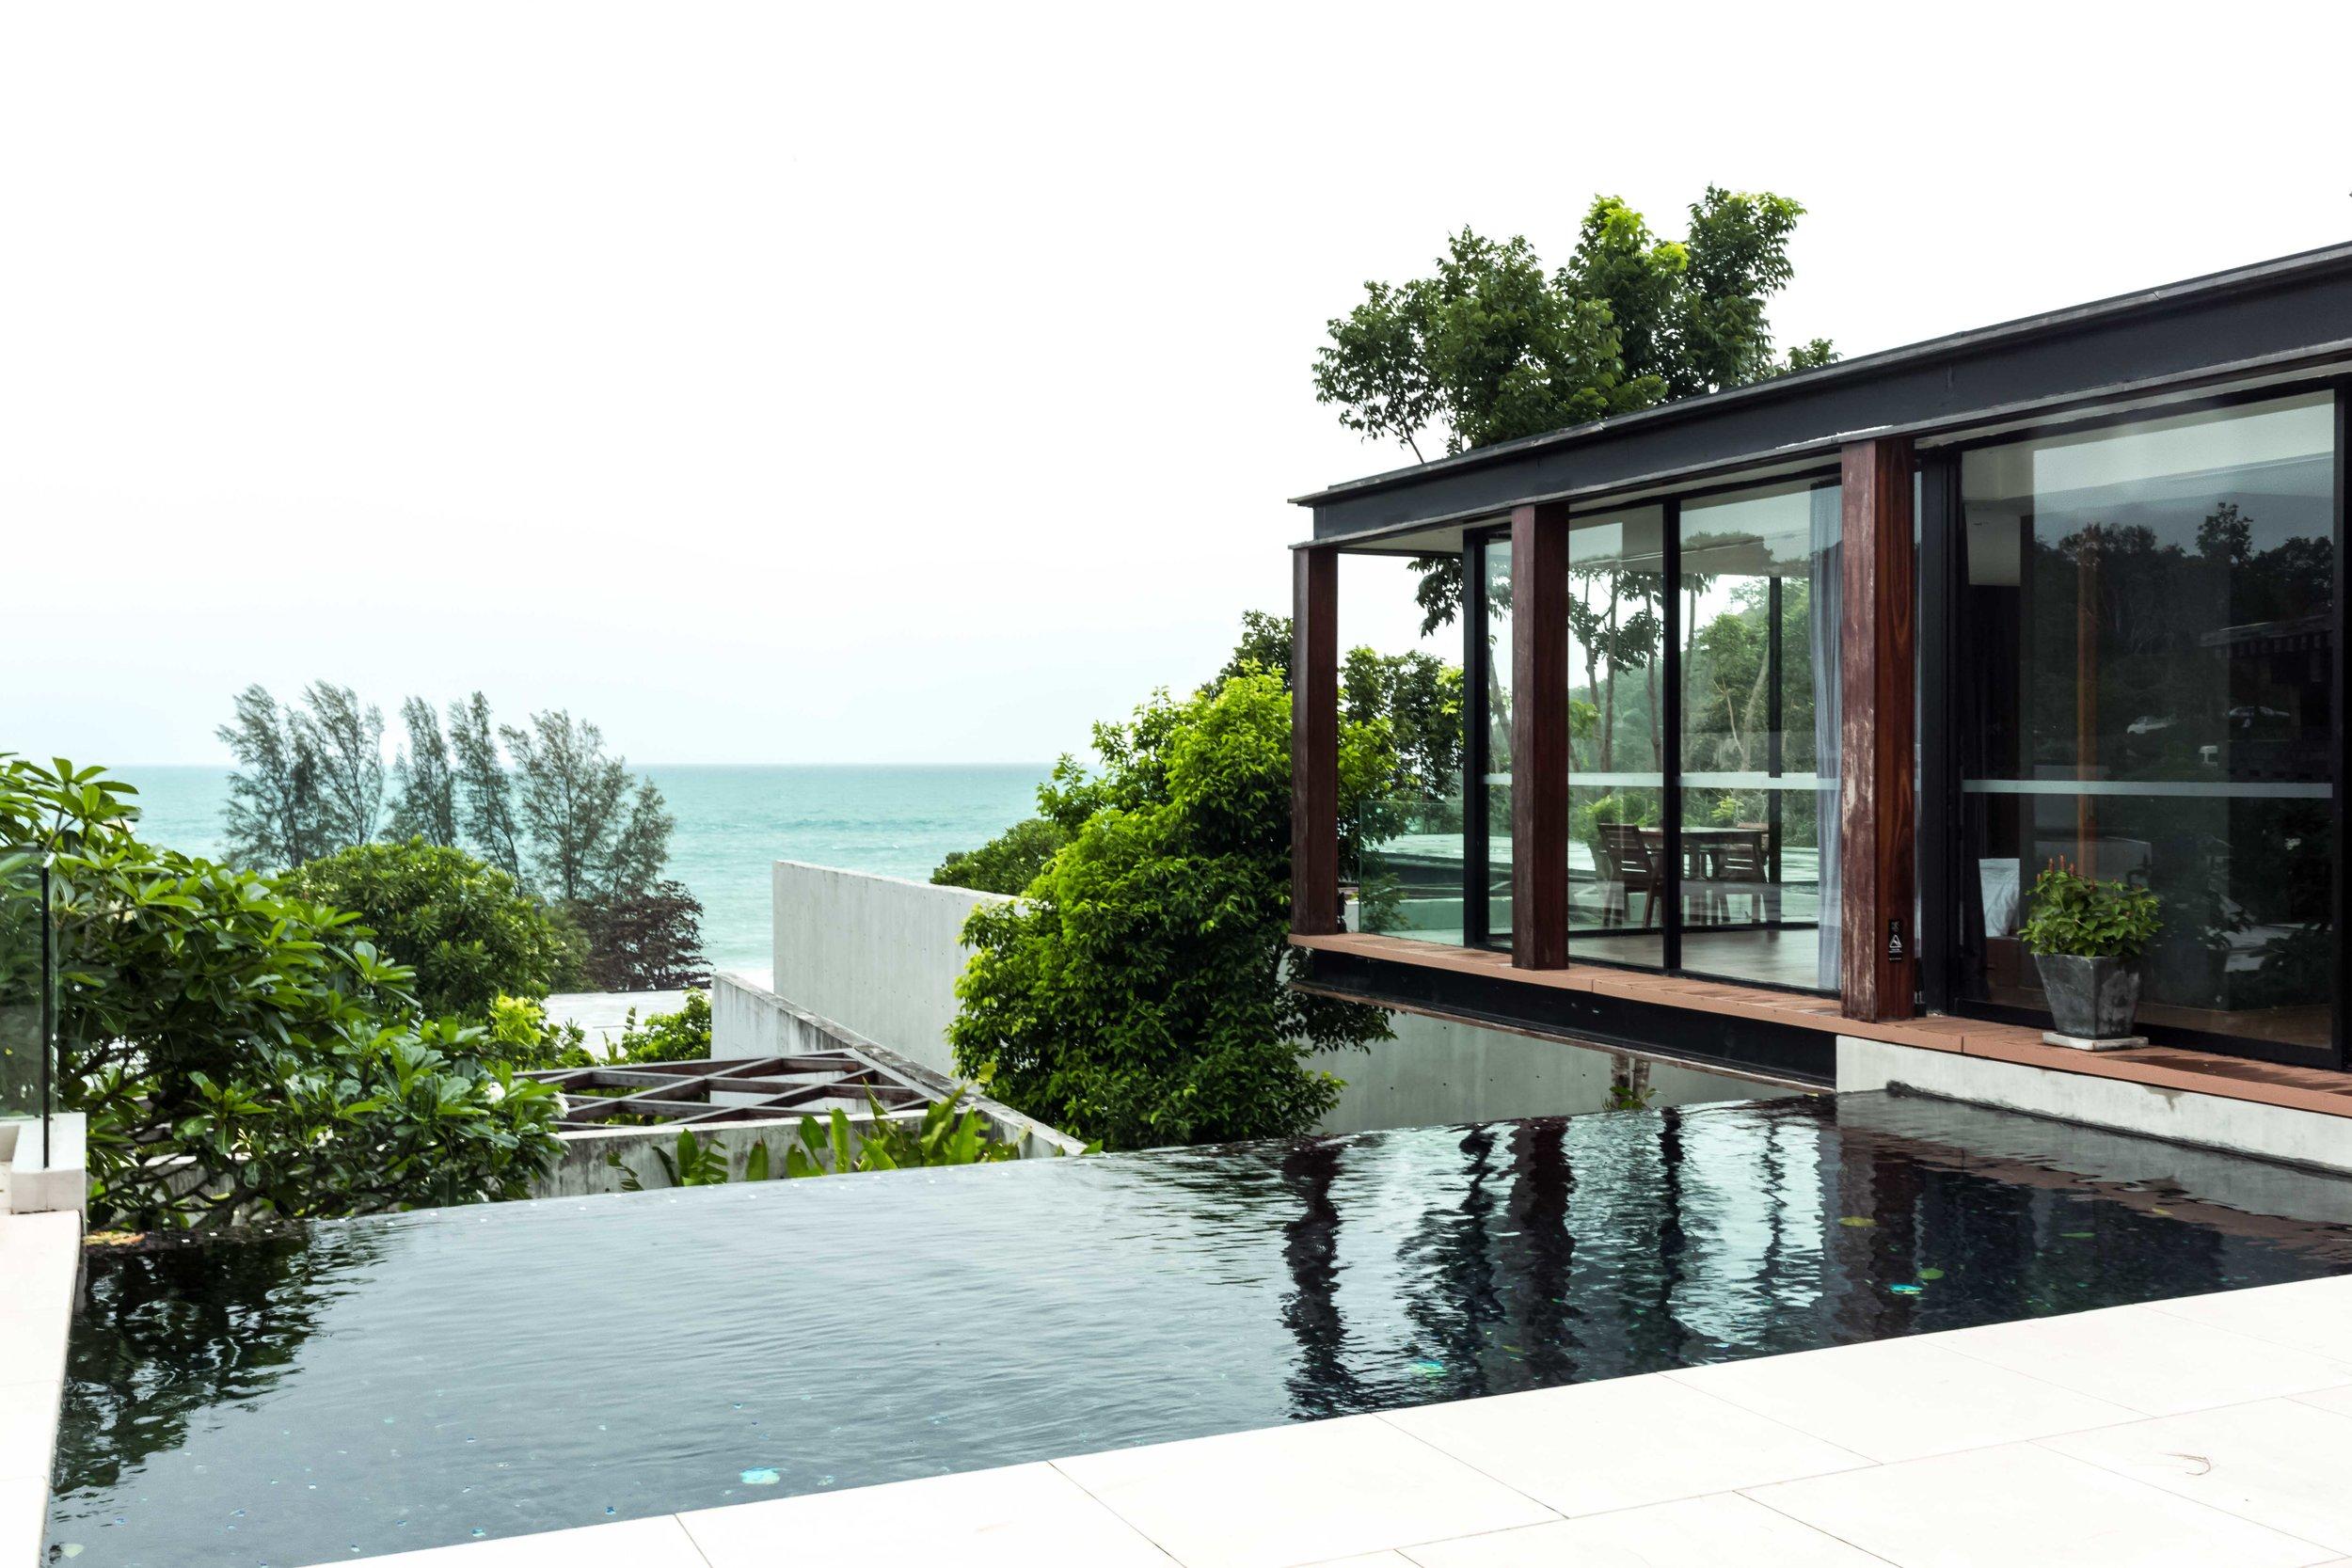 naka phuket thailand